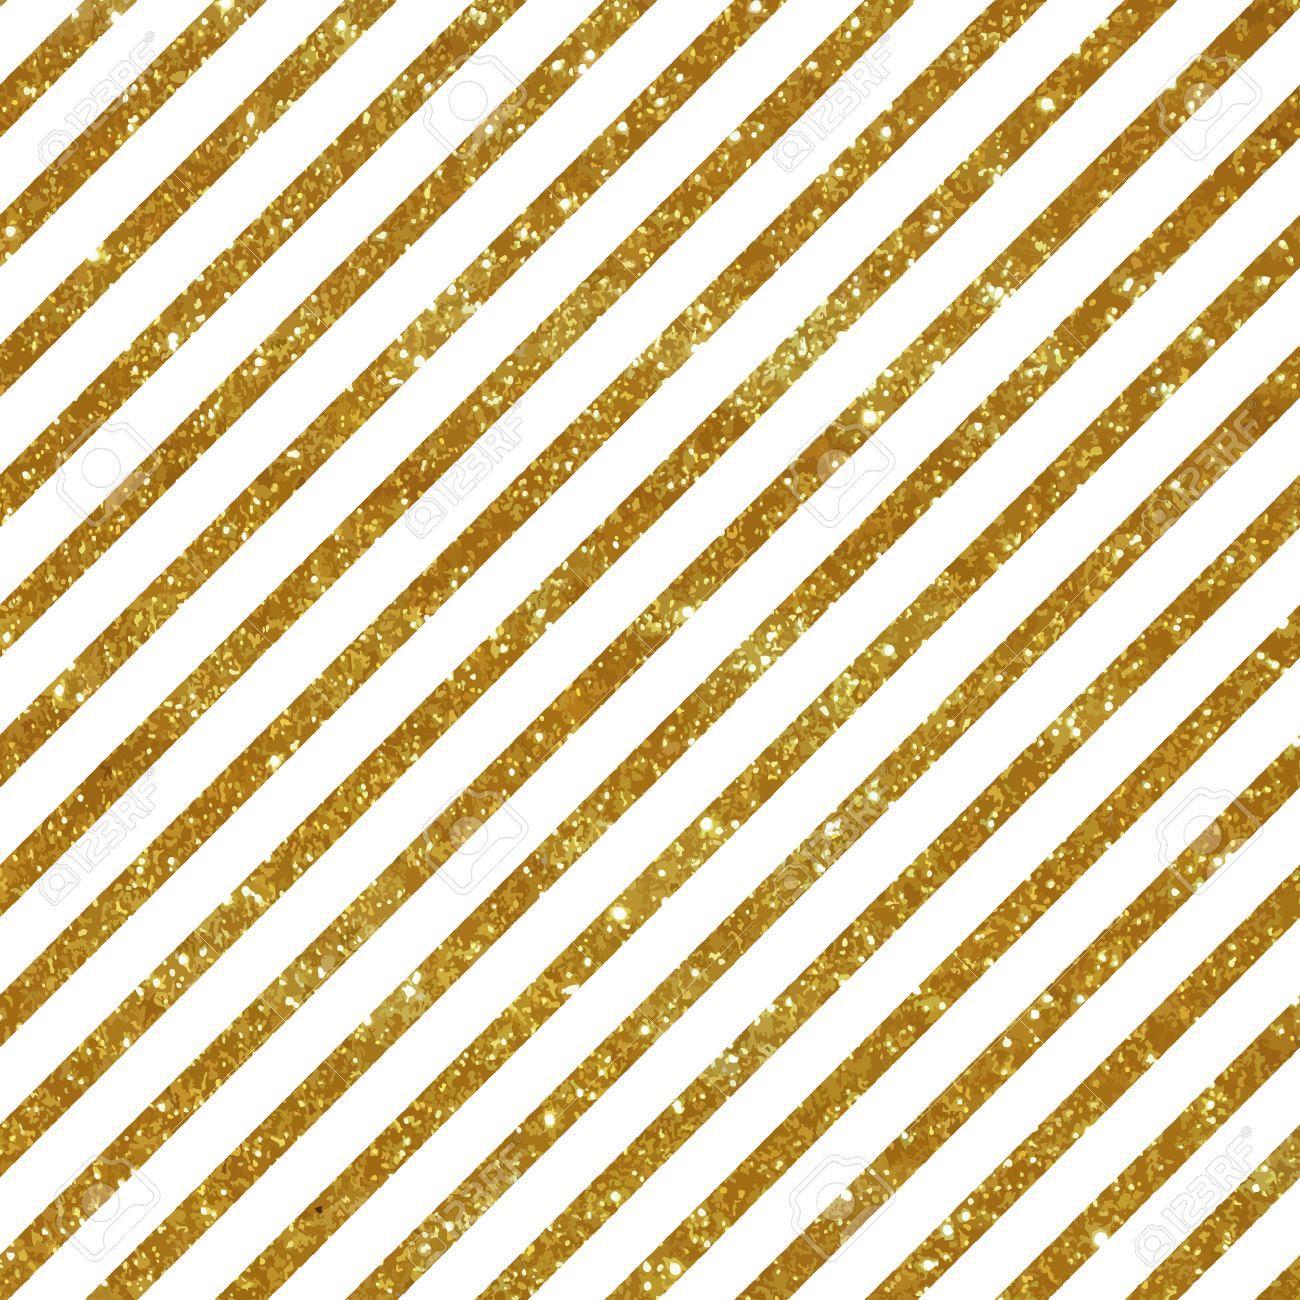 Seamless pattern with diagonal golden stripes. Glitter texture. - 40801692